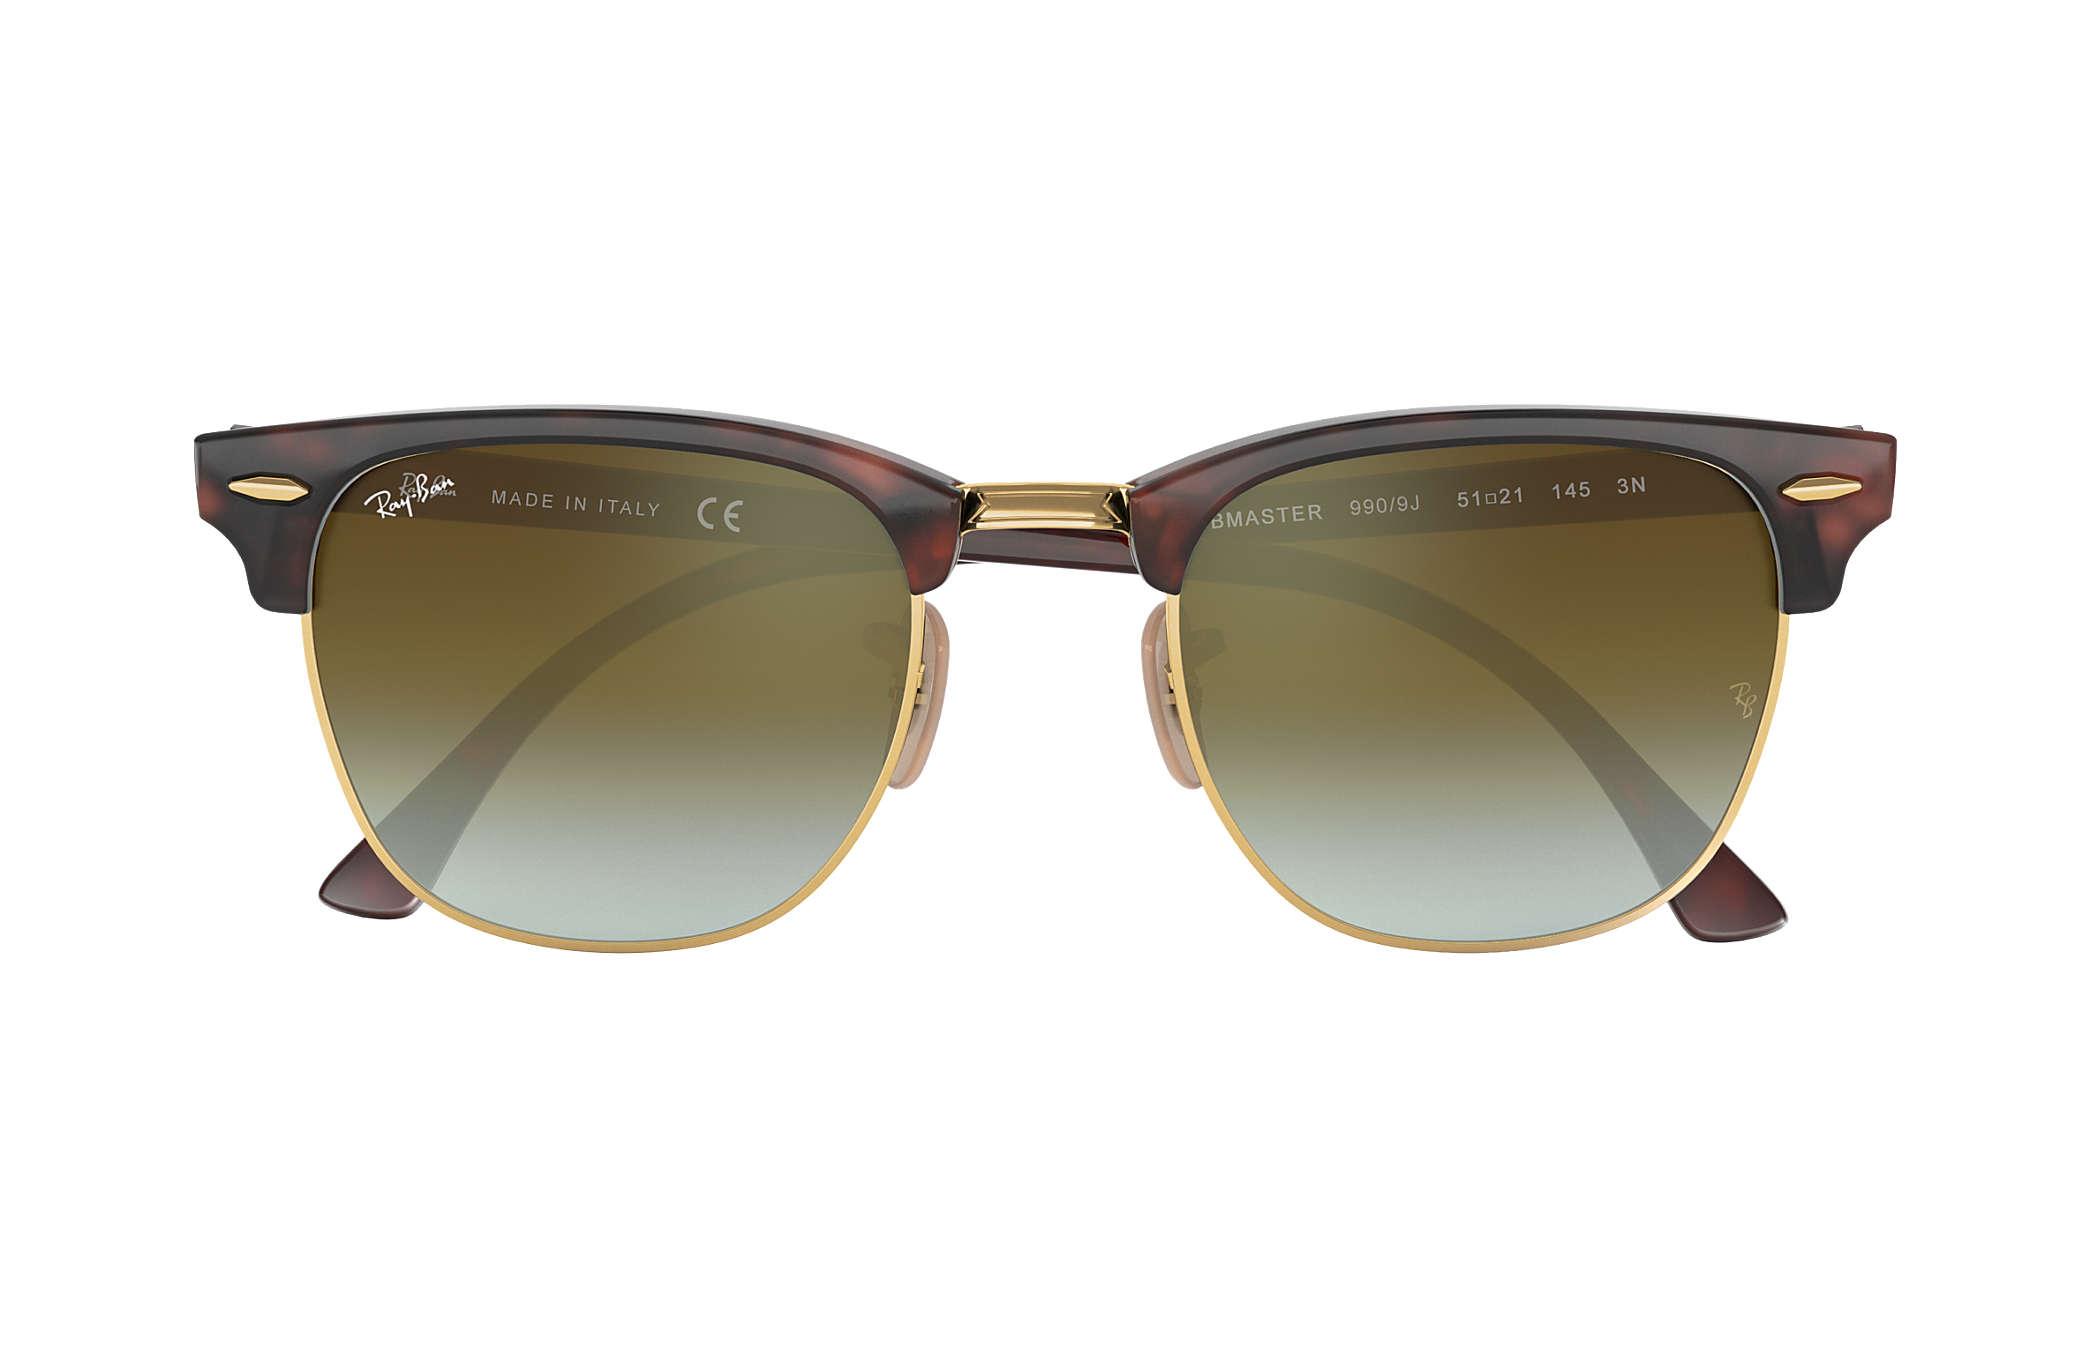 2afe56bc934 switzerland ray ban 0rb3016 clubmaster flash lenses gradient tortoisegold  tortoise sun 3ca96 f32e4